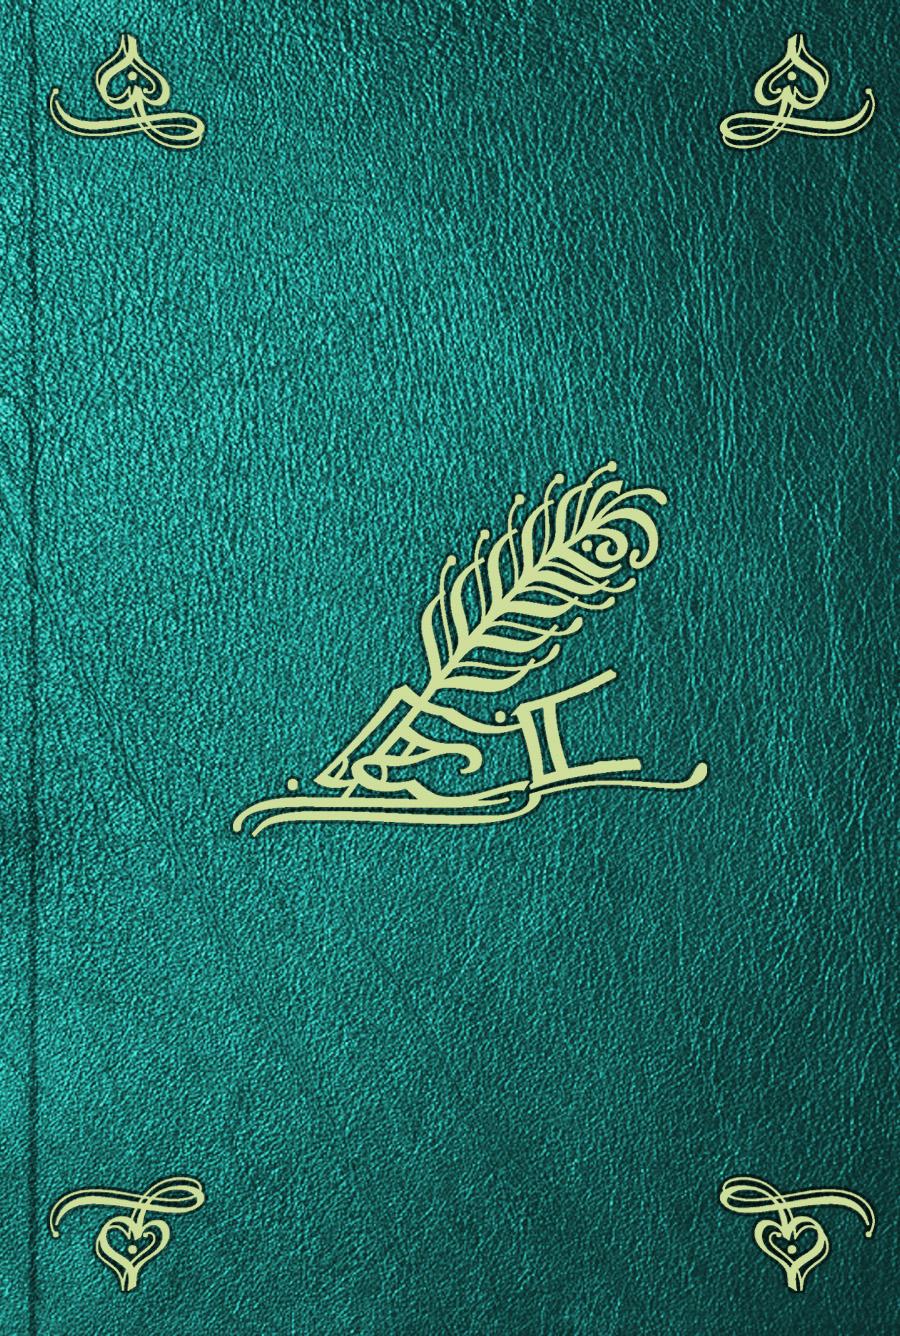 Olof Celsius Geschichte Konig Erichs des Vierzehnten olof bjoerner olof s files a bob dylan performance guide volume 2 1970 1977